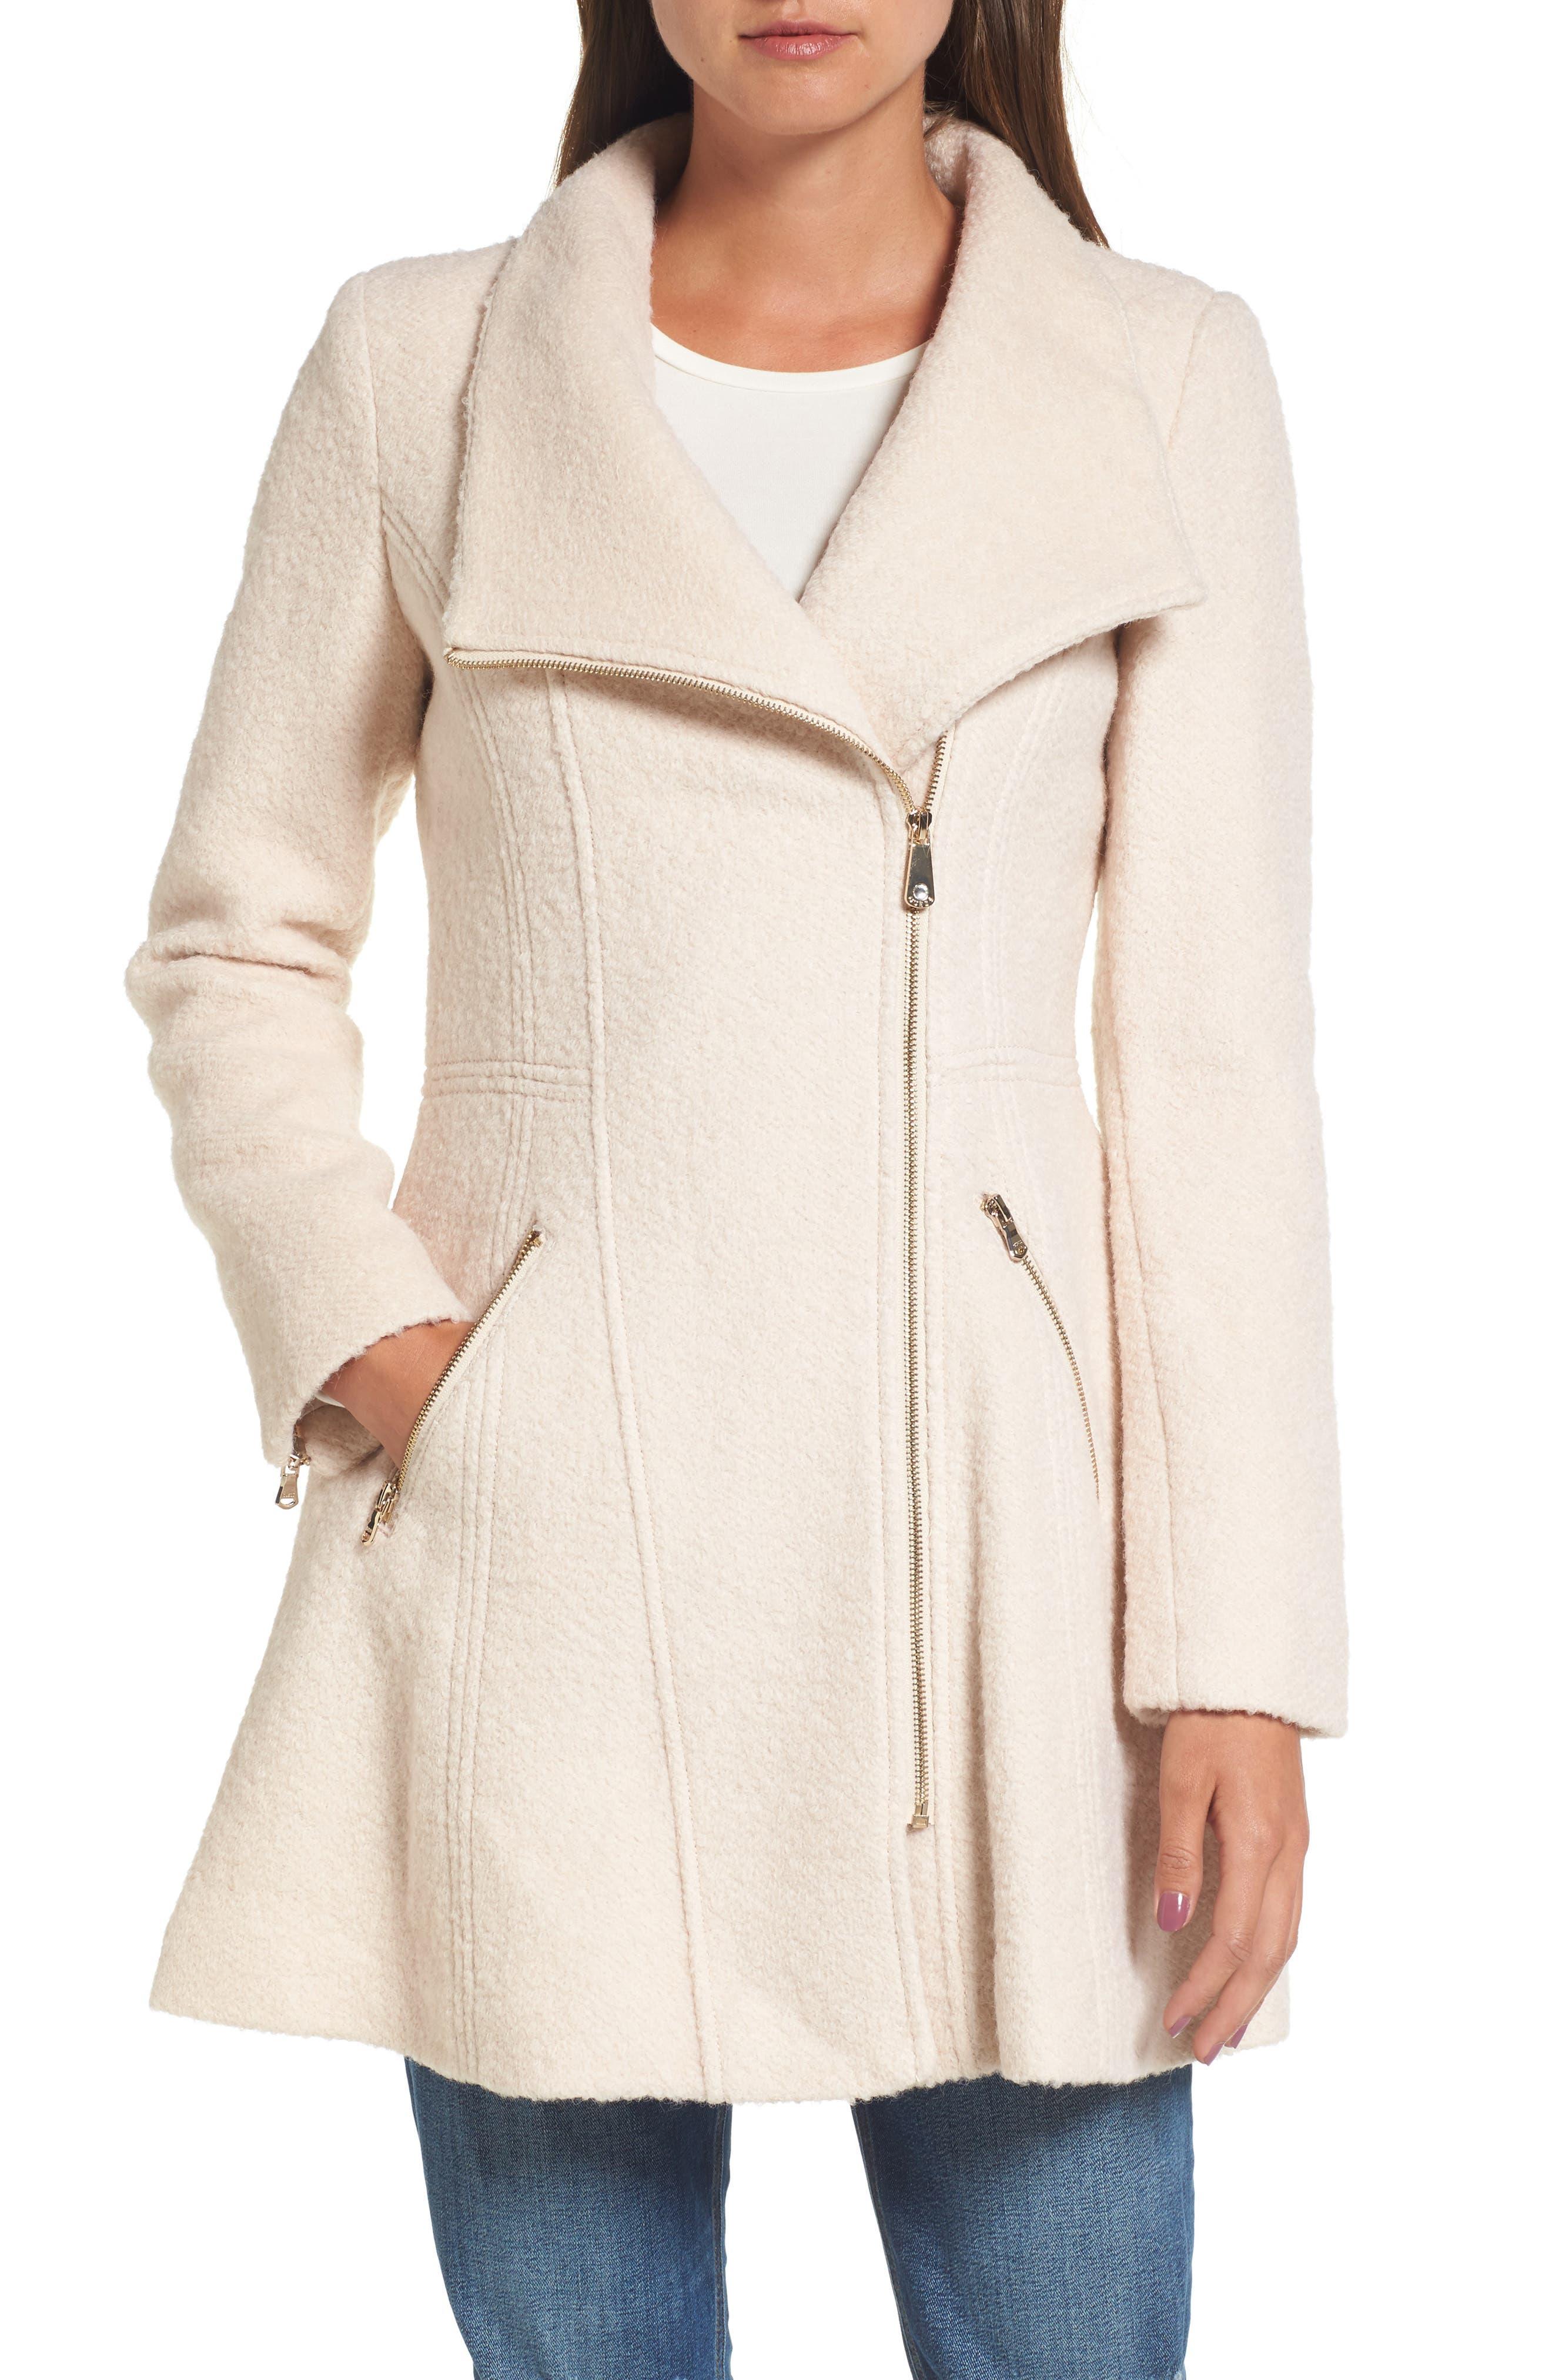 Guess Asymmetrical Coat